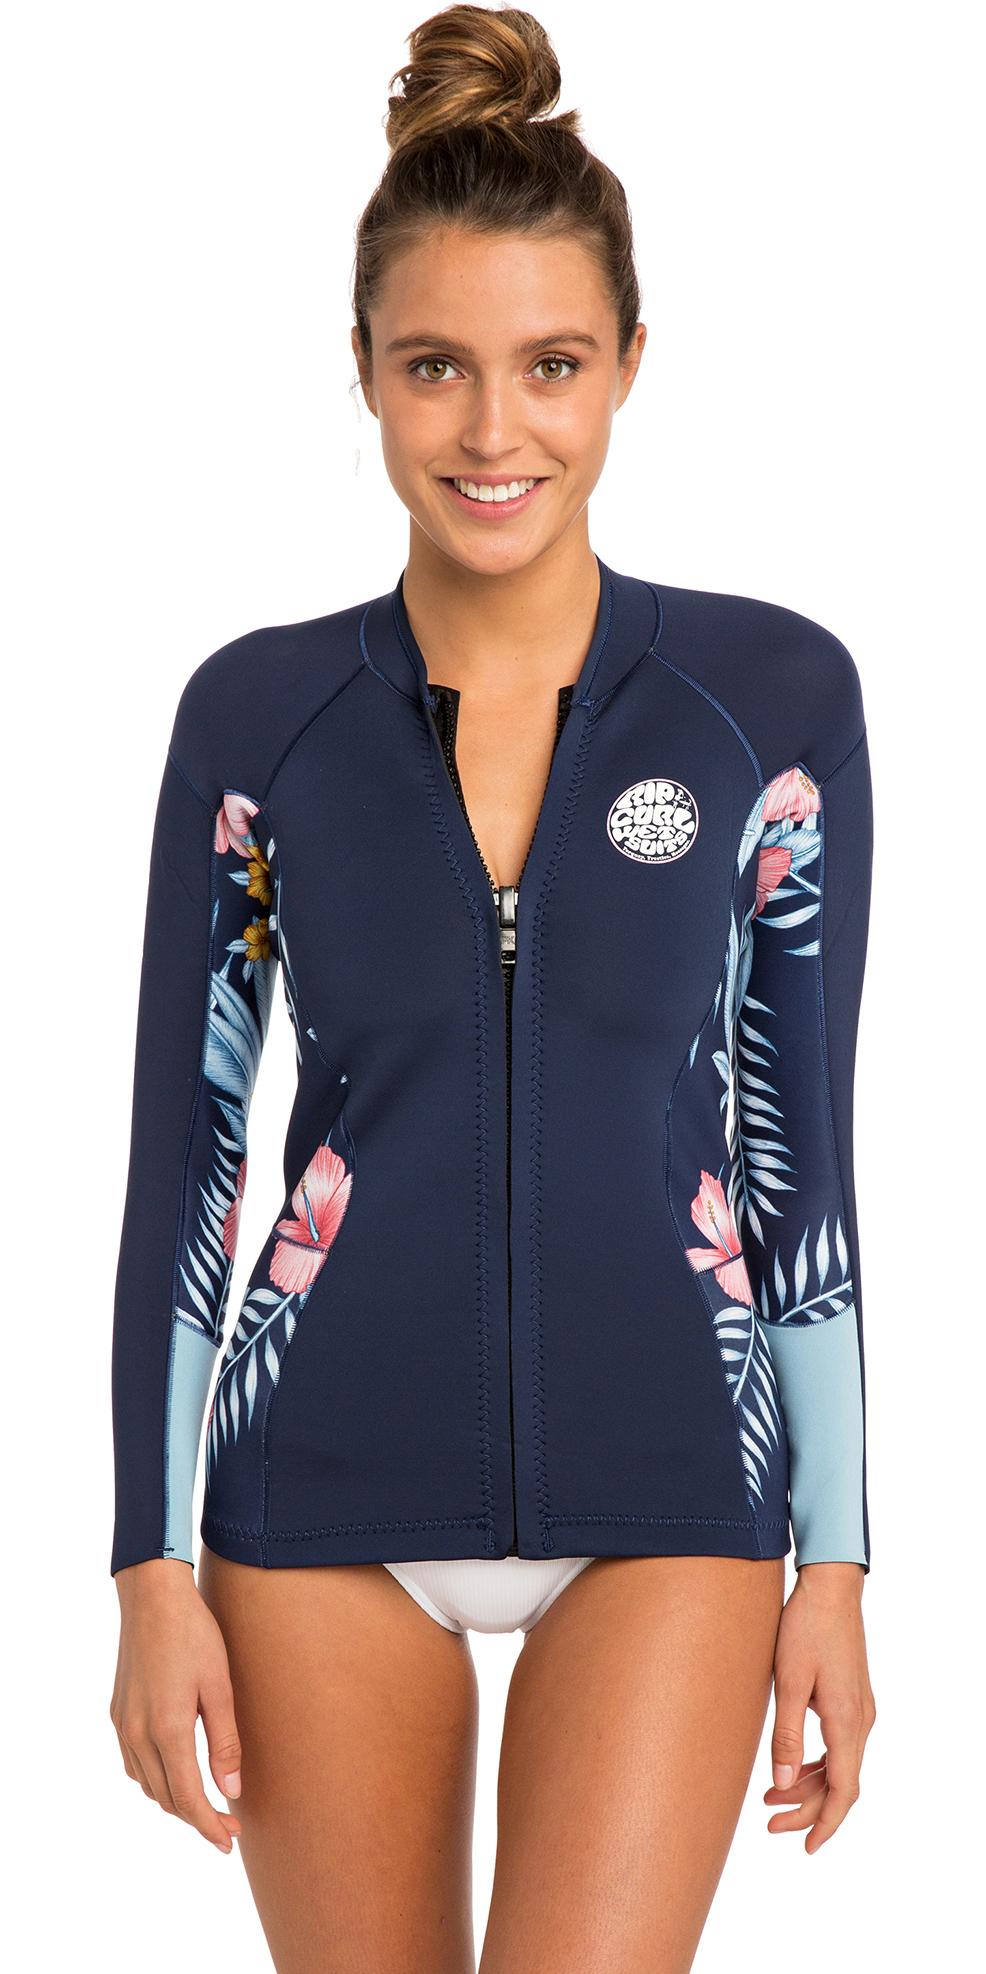 6c4b26a6999824 2019 Rip Curl Womens Dawn Patrol Long Sleeve Neoprene Jacket Navy Wve8bw -  Womens Neoprene   Wetsuit Outlet